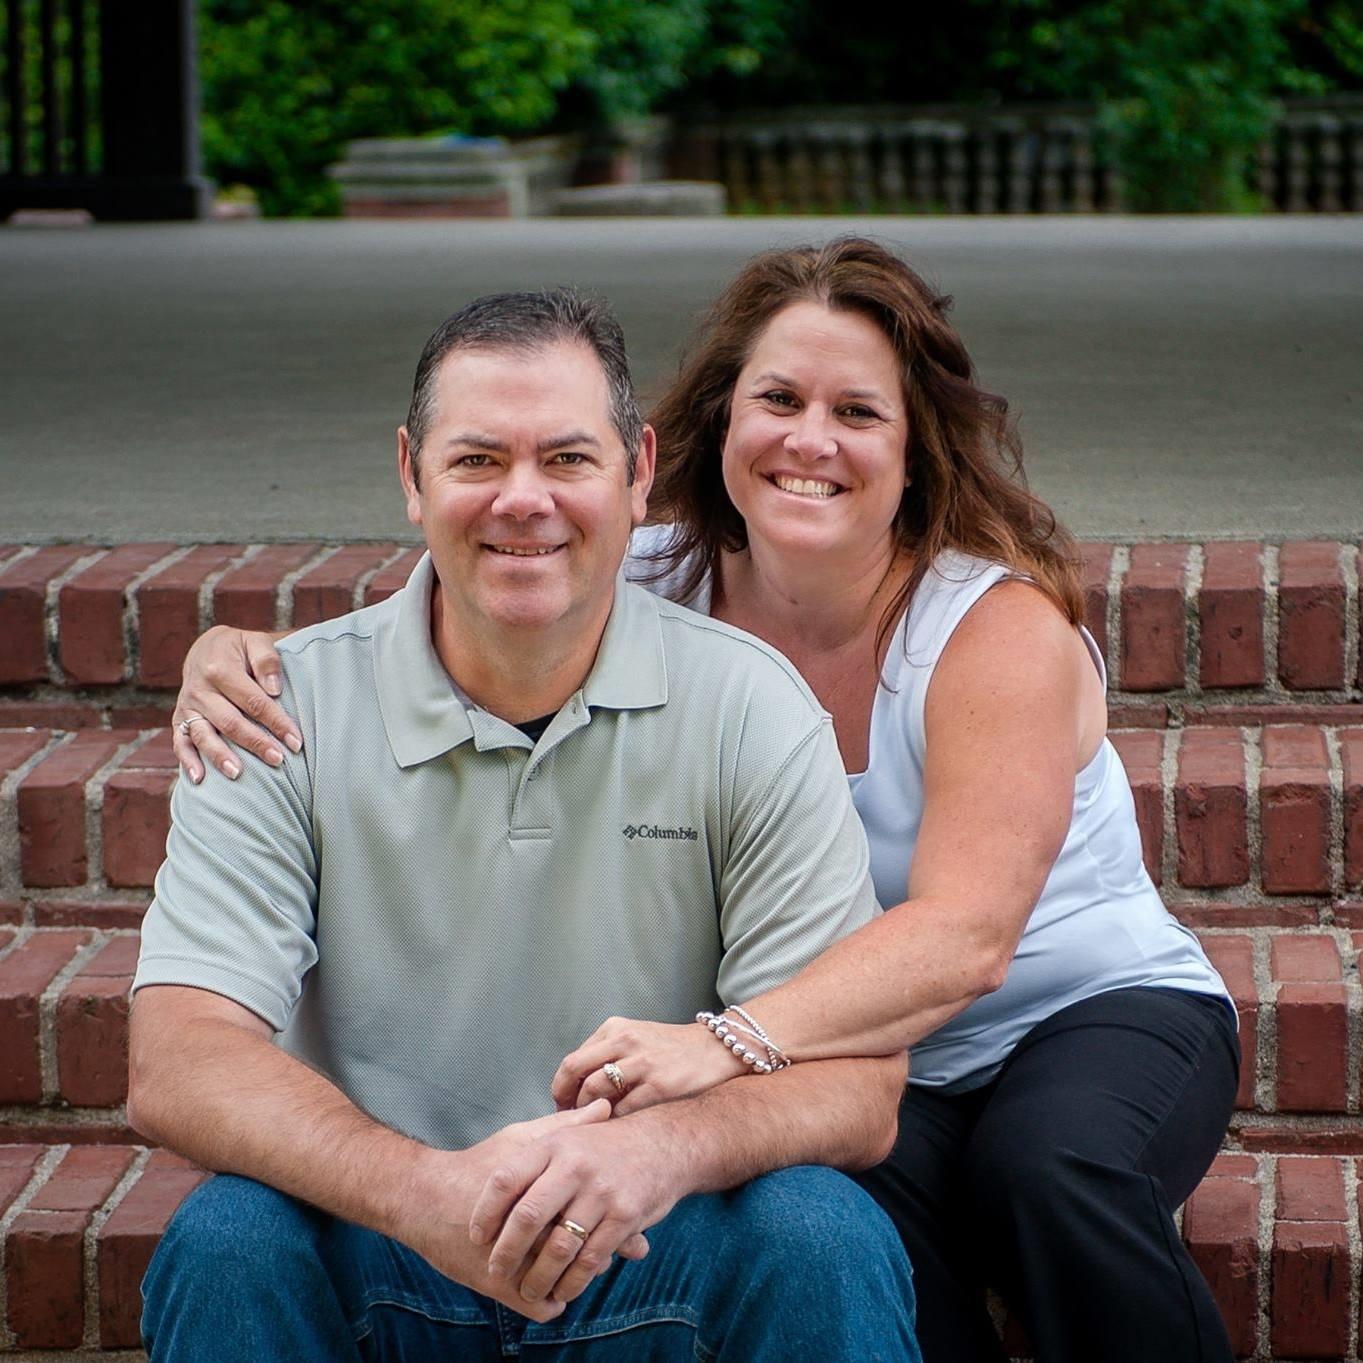 John and wife.jpg